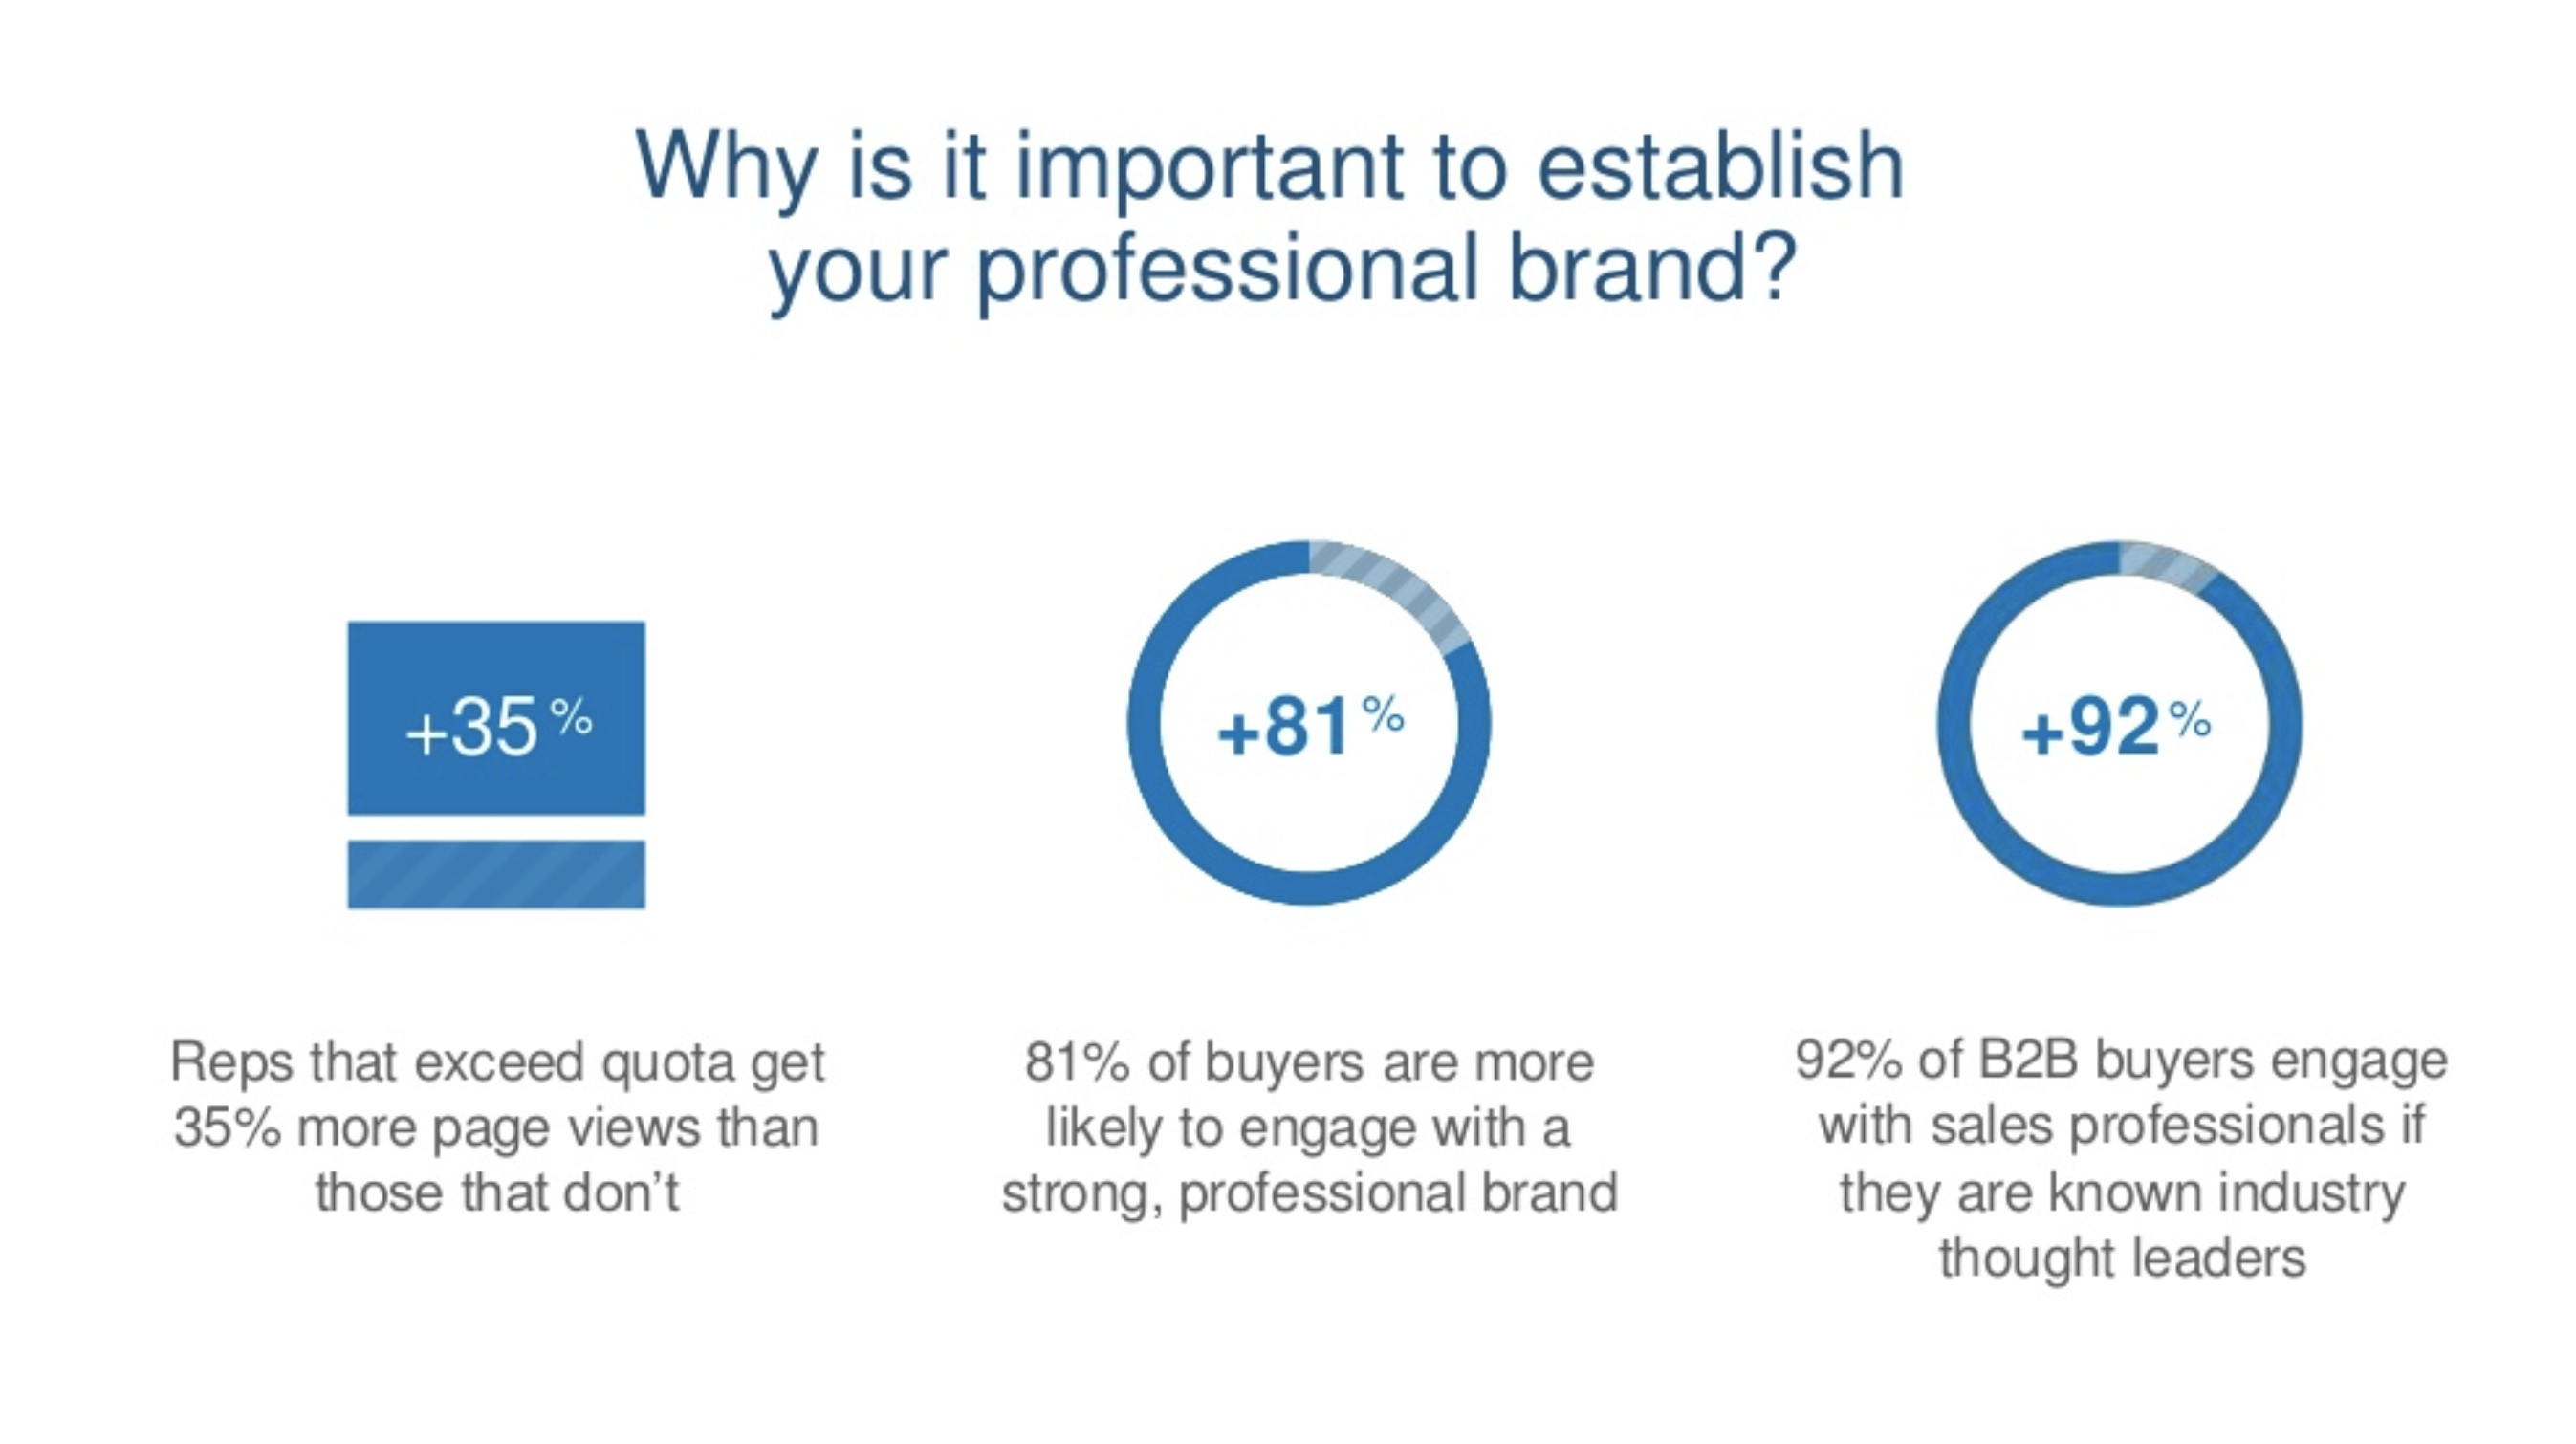 Establish your professional brand